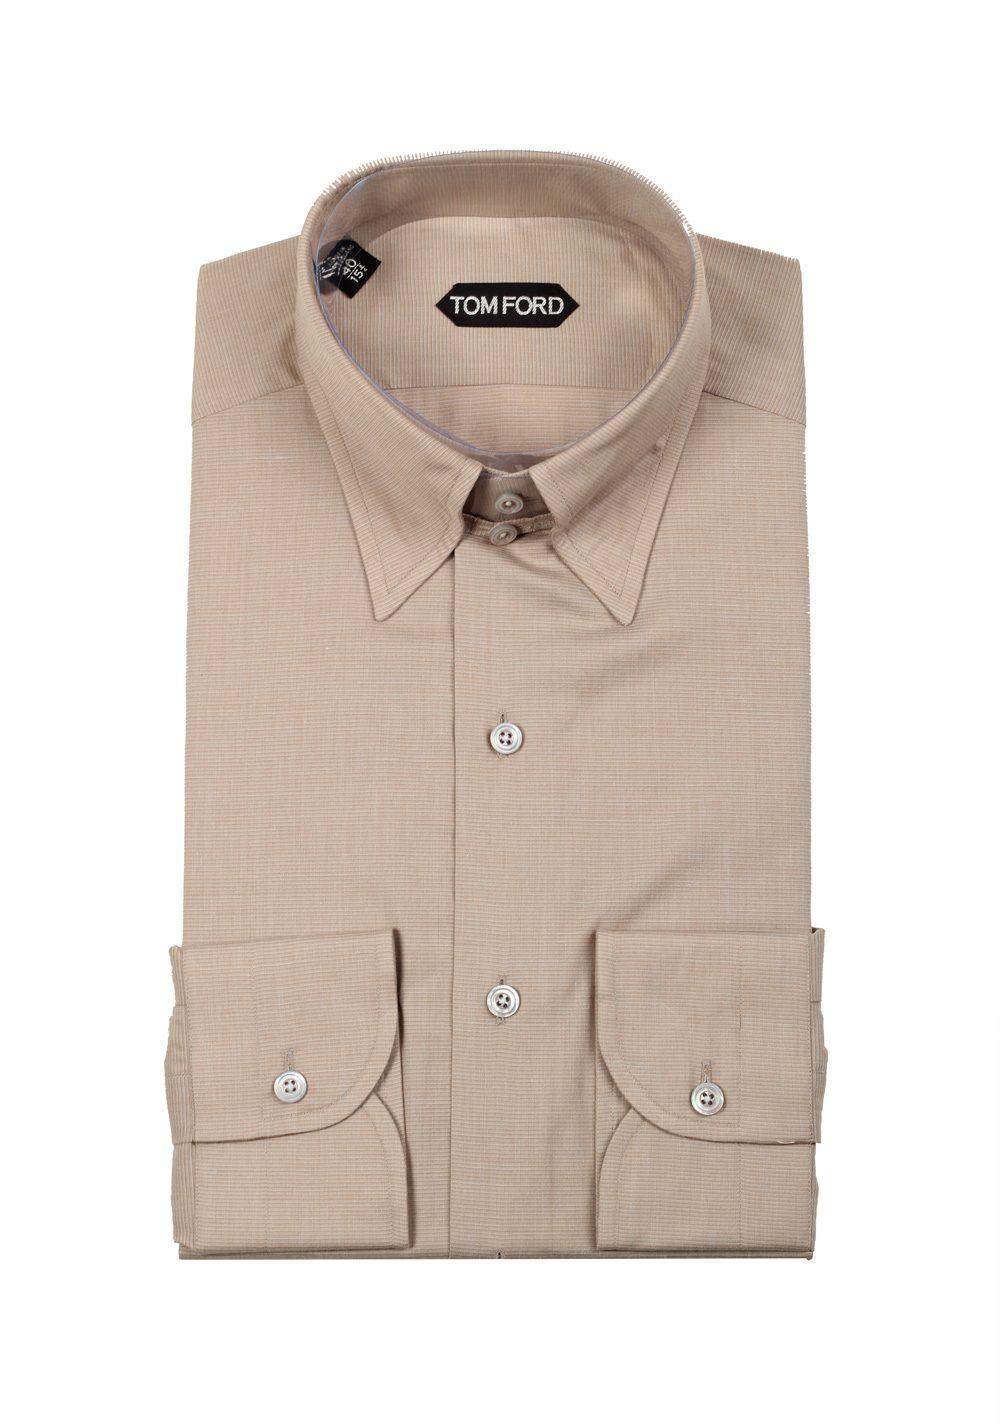 Tom Ford Grayish Beige High Collar Dress Shirt Size 40 1575 Us